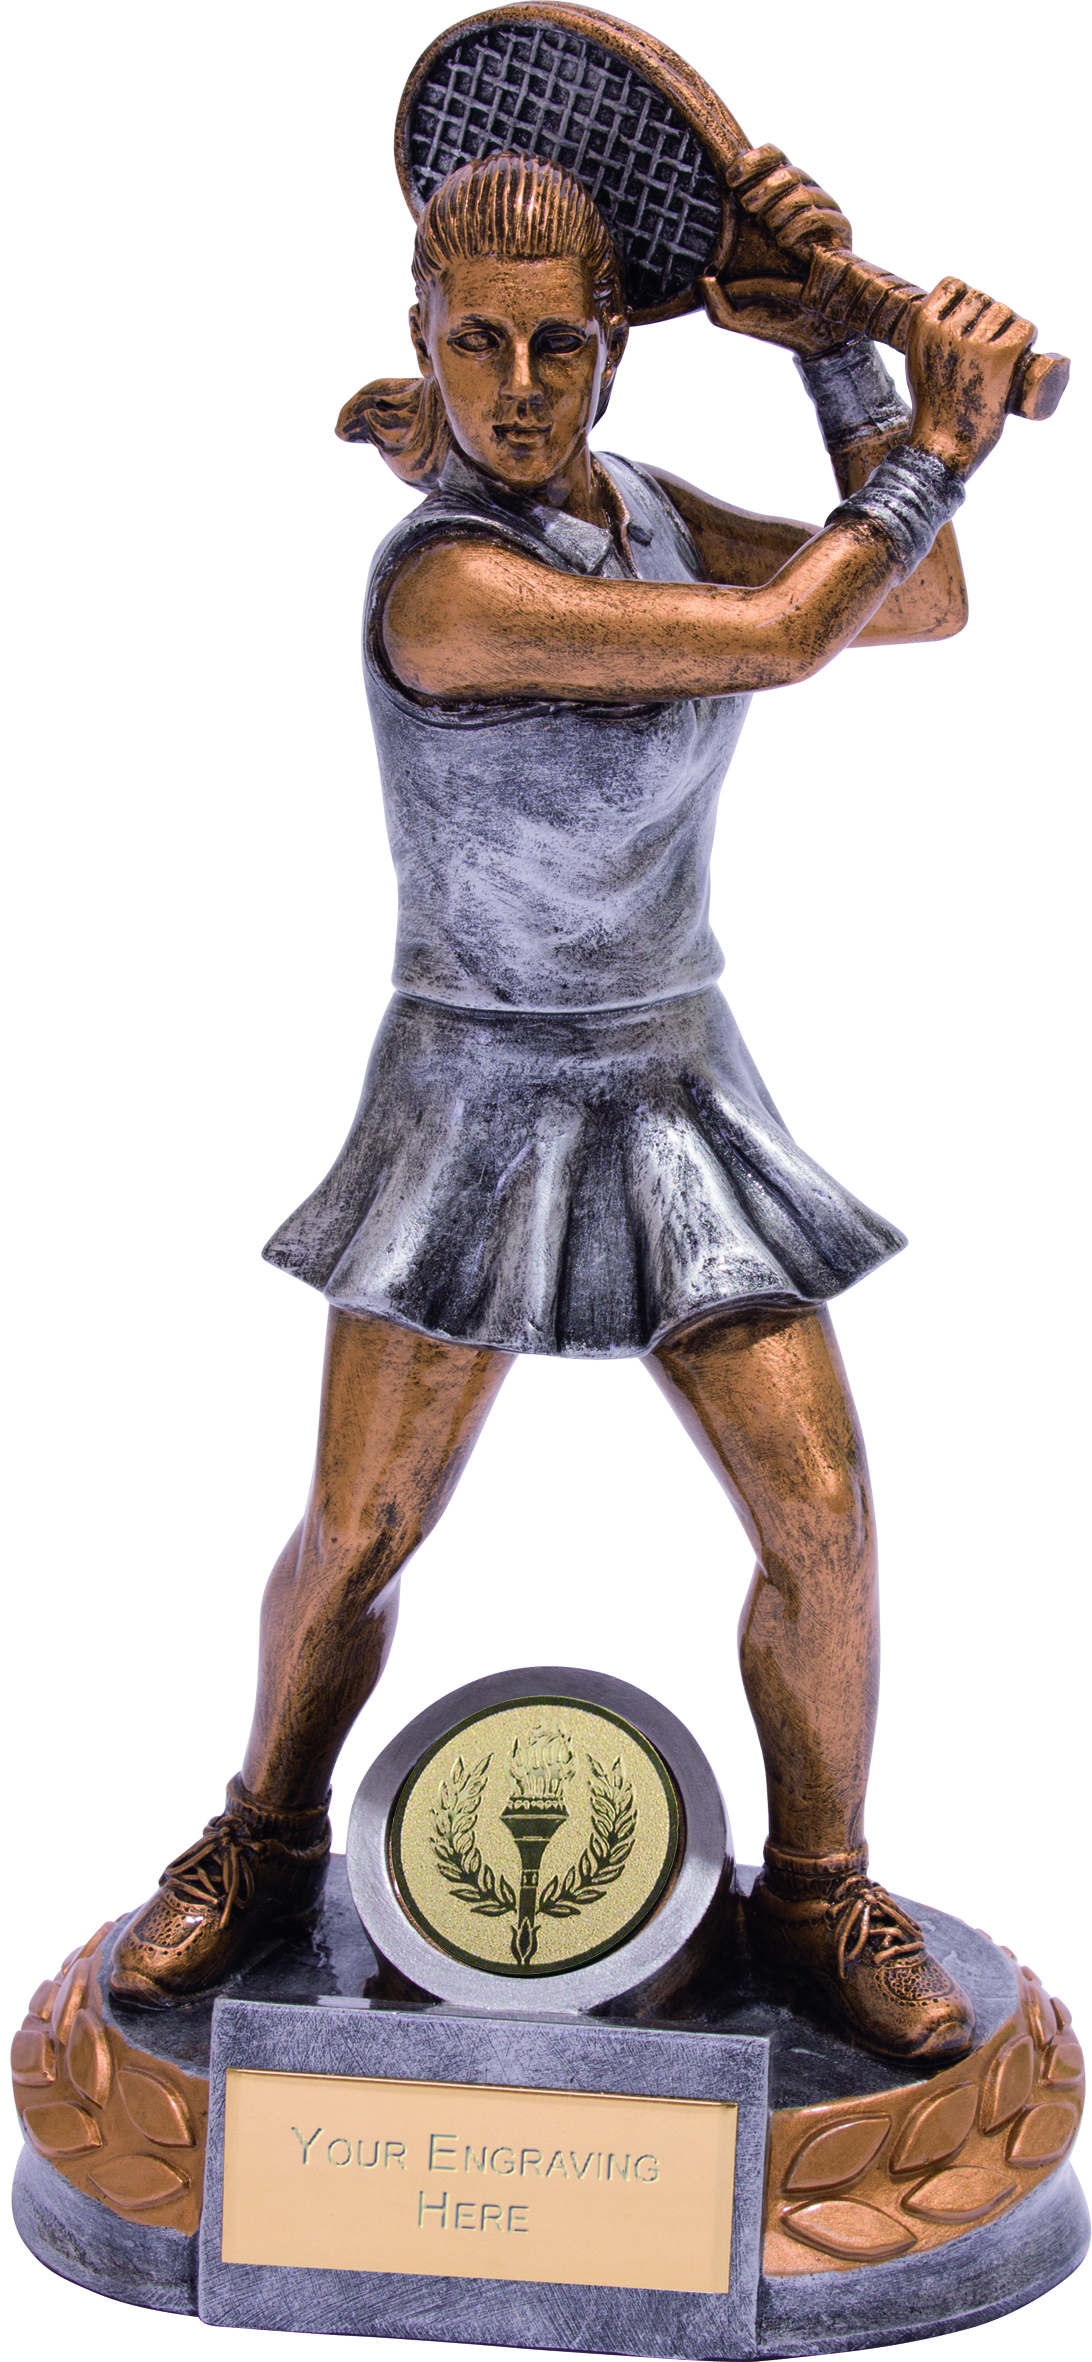 "Female Tennis Player Trophy Silver & Gold 20cm (8"")"